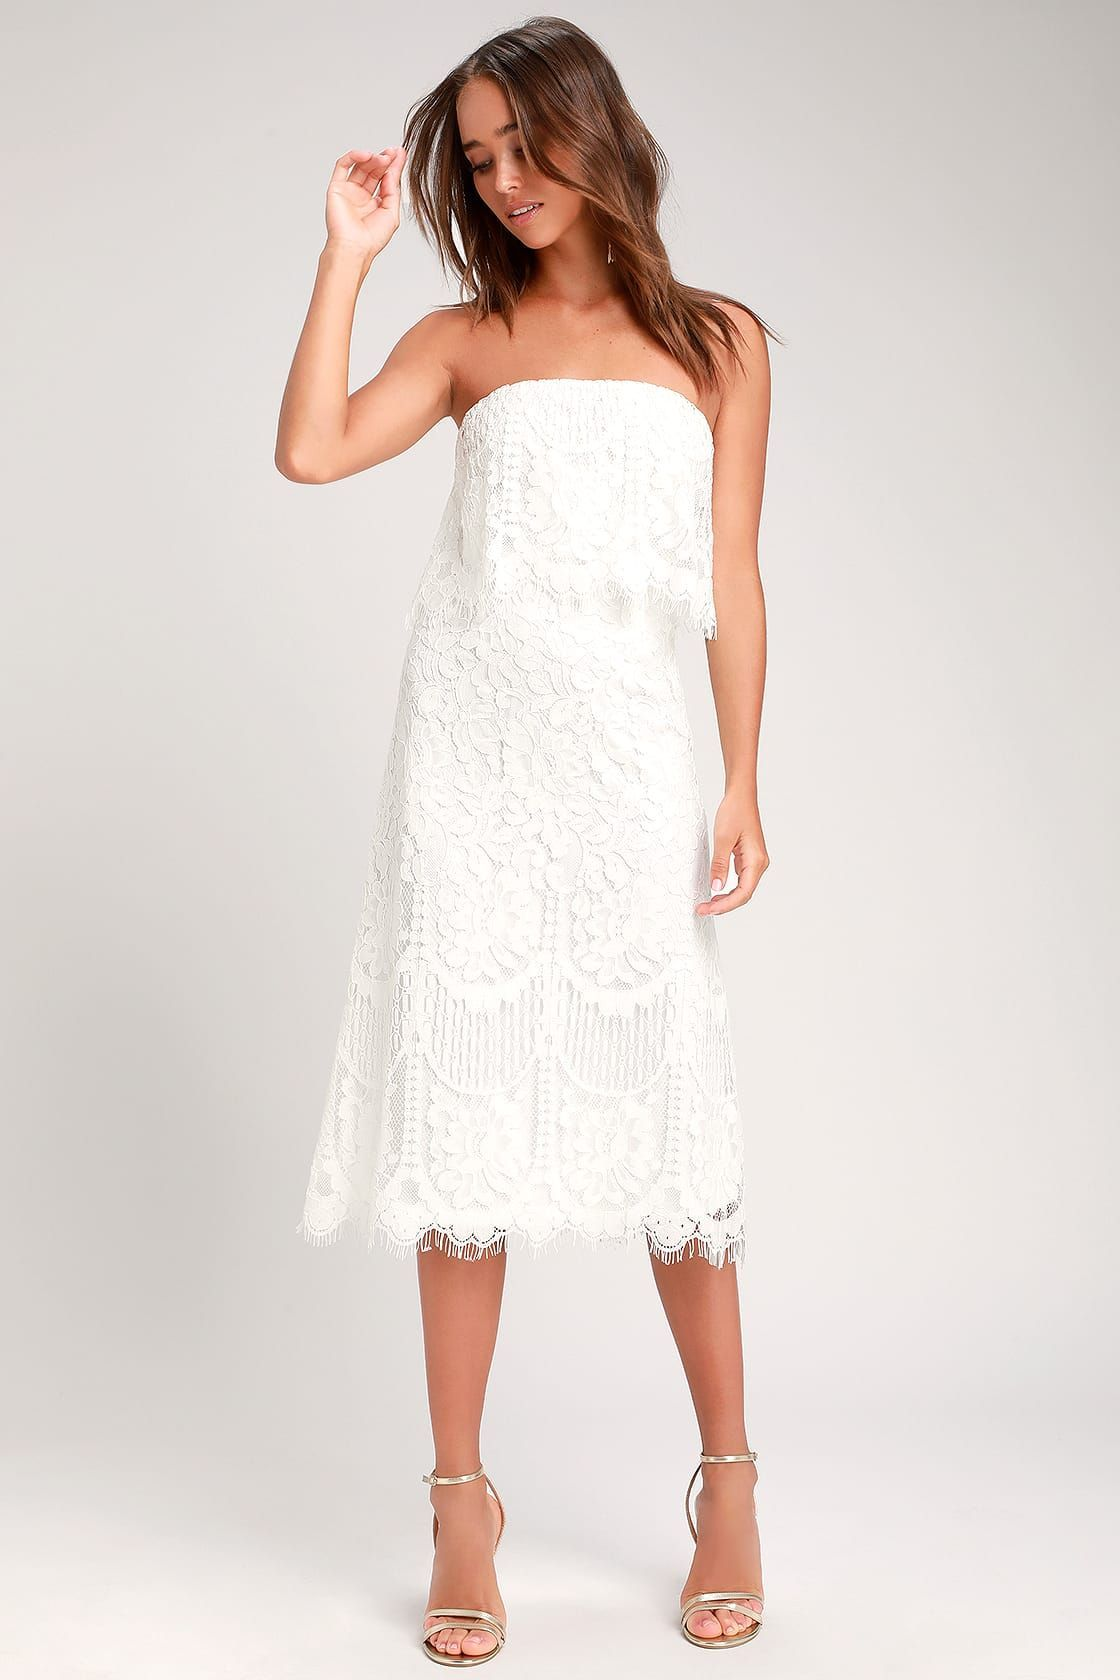 Pin By Komal Rana On Fashion In 2021 White Dresses For Women Strapless Midi Dress White Lace Midi Dress [ 1680 x 1120 Pixel ]